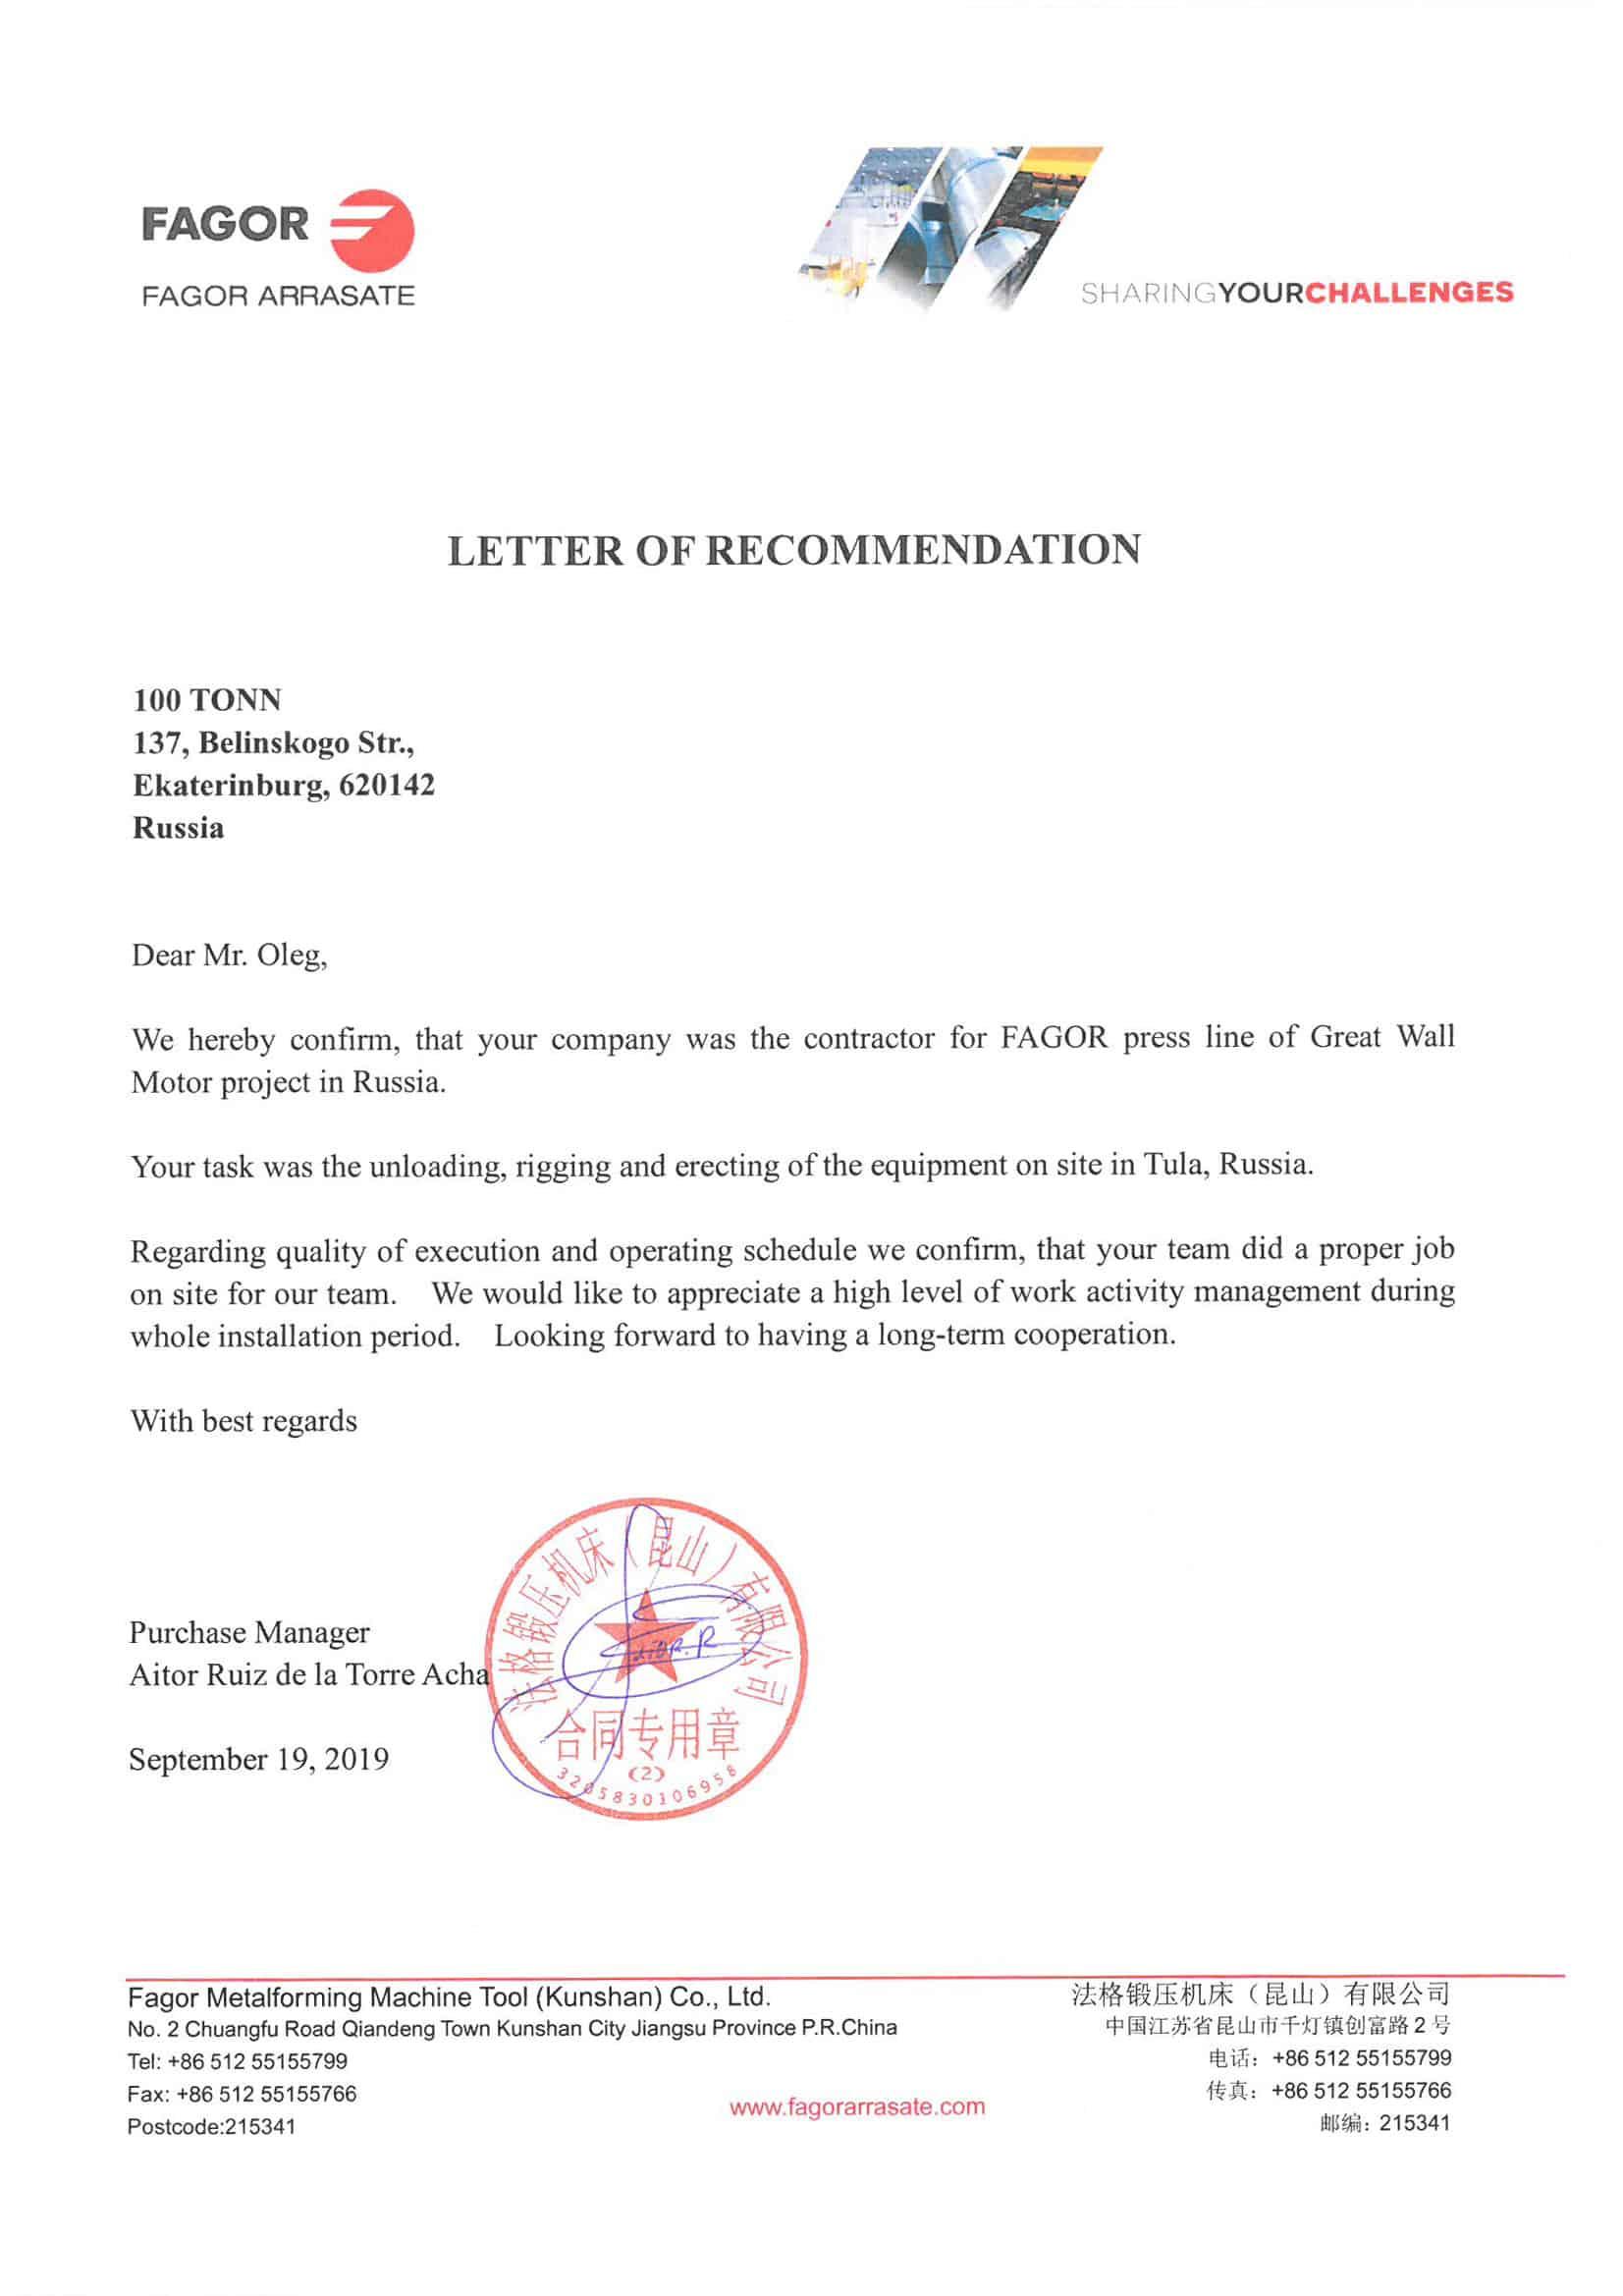 Отзыв FAGOR о работе «100 ТОНН МОНТАЖ»